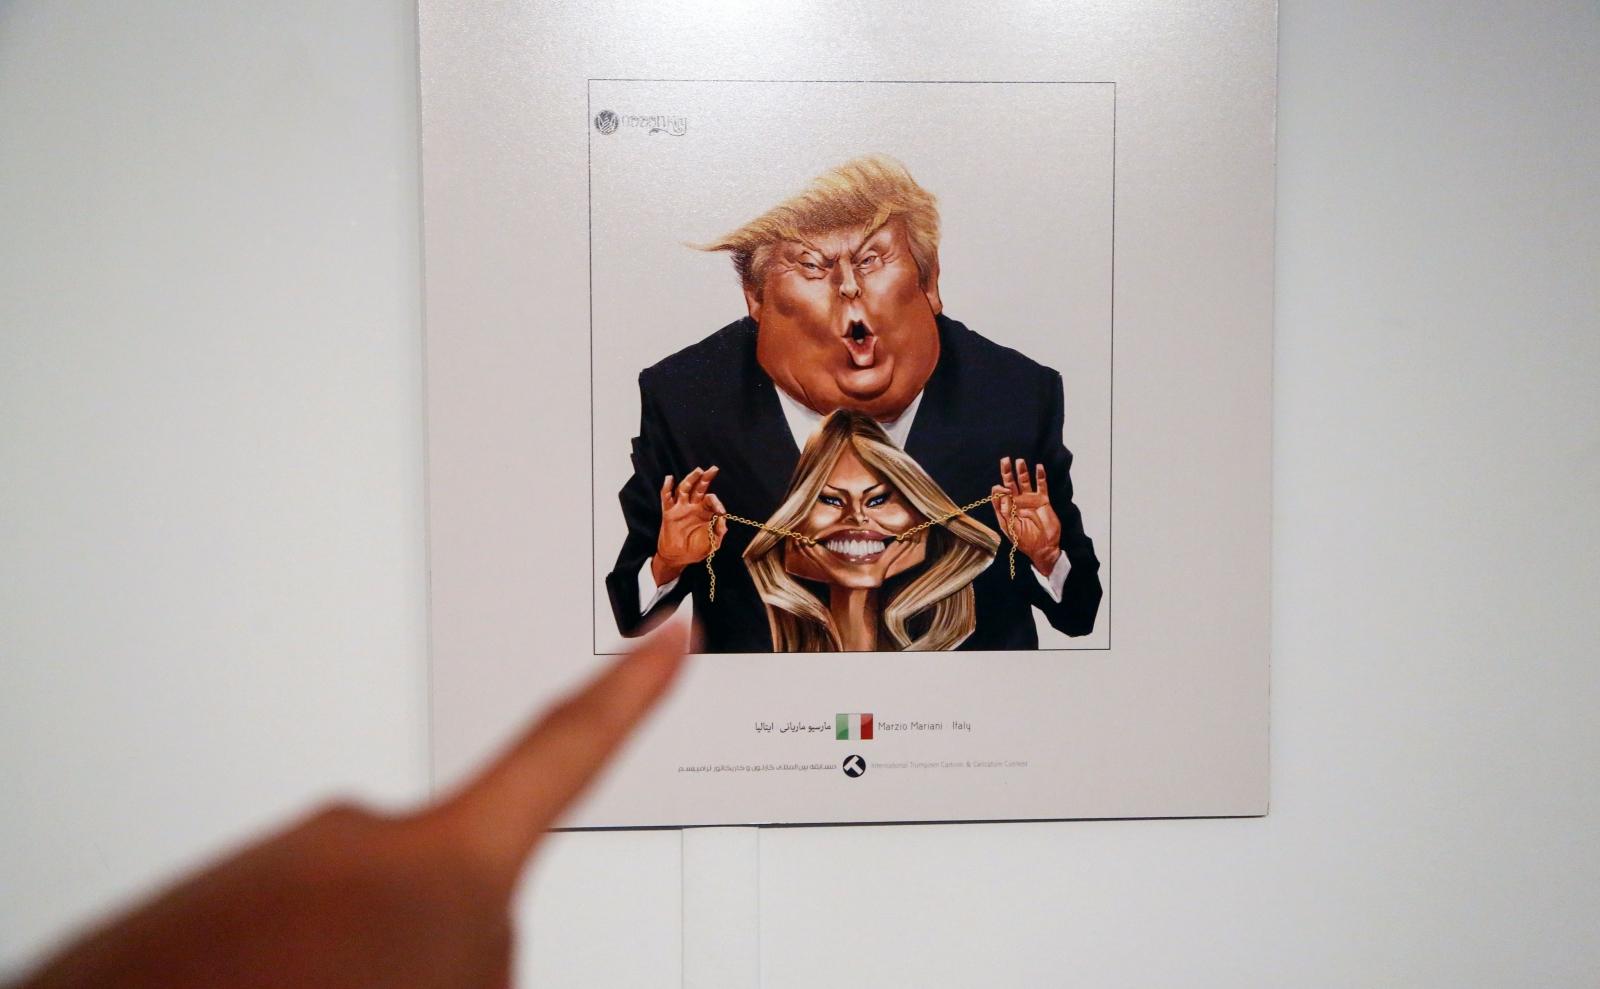 Iran cartoon contest and Trump